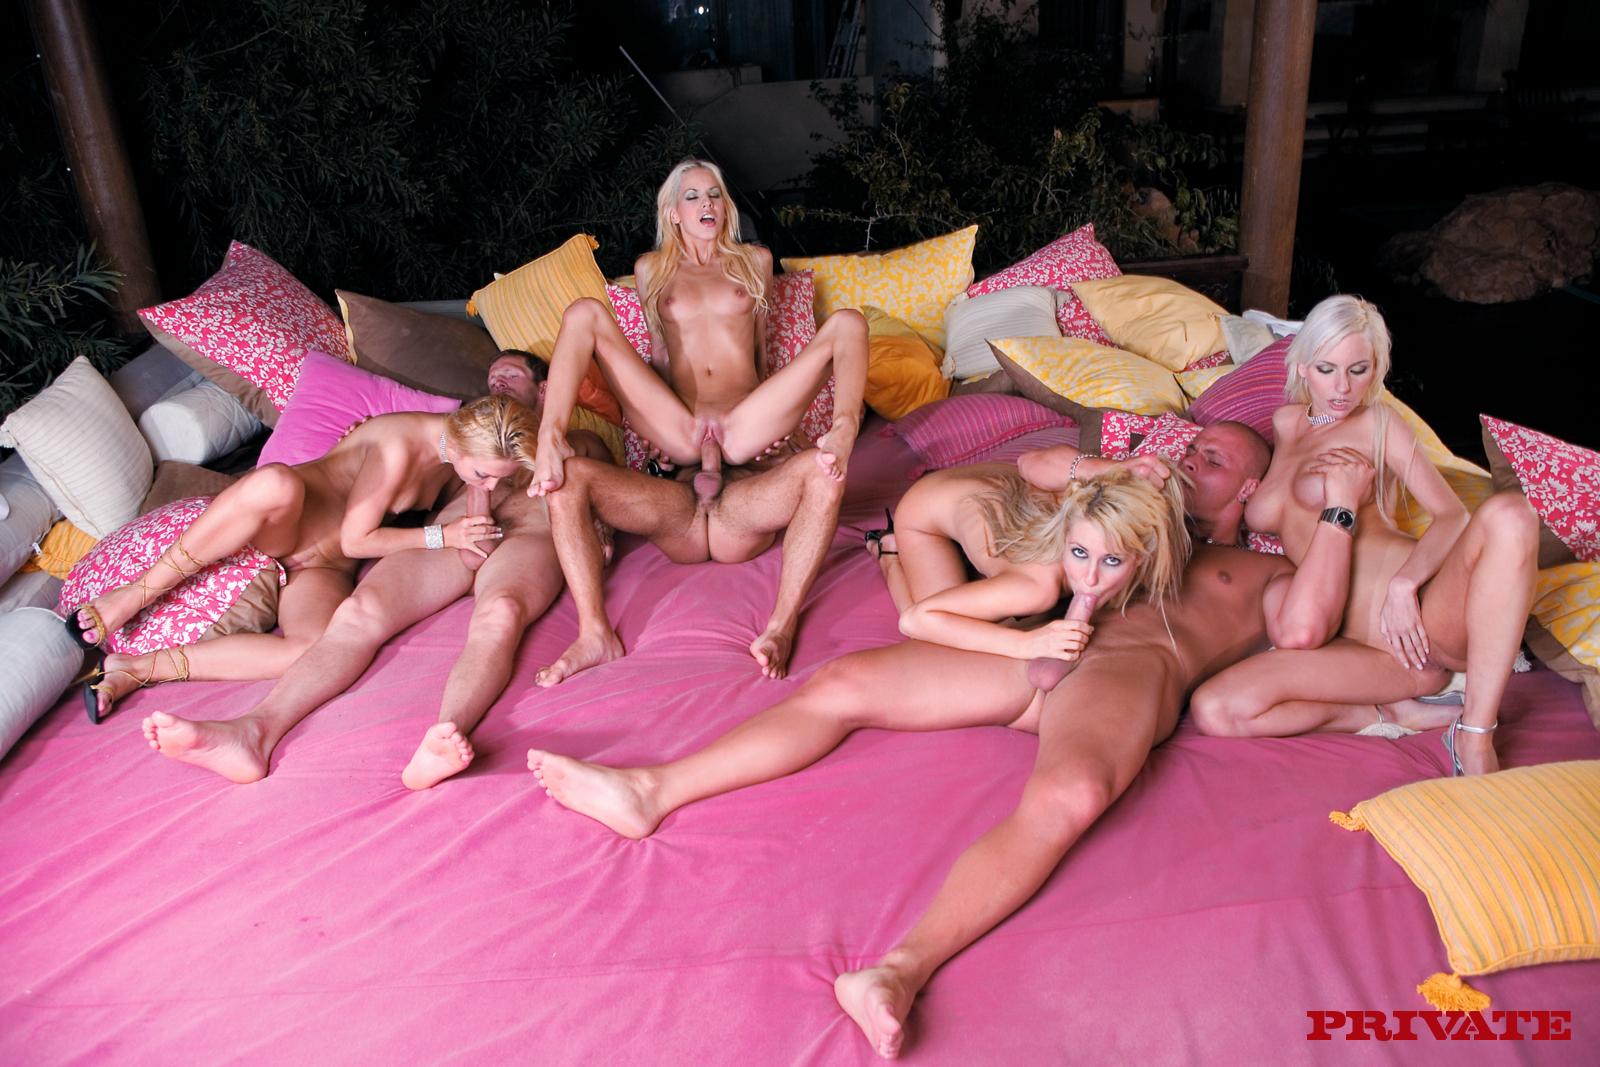 Alexis Jessica Girl Nicky Angel Boroka Balls Ibiza Sex Party Porno Gambar Nomor 2